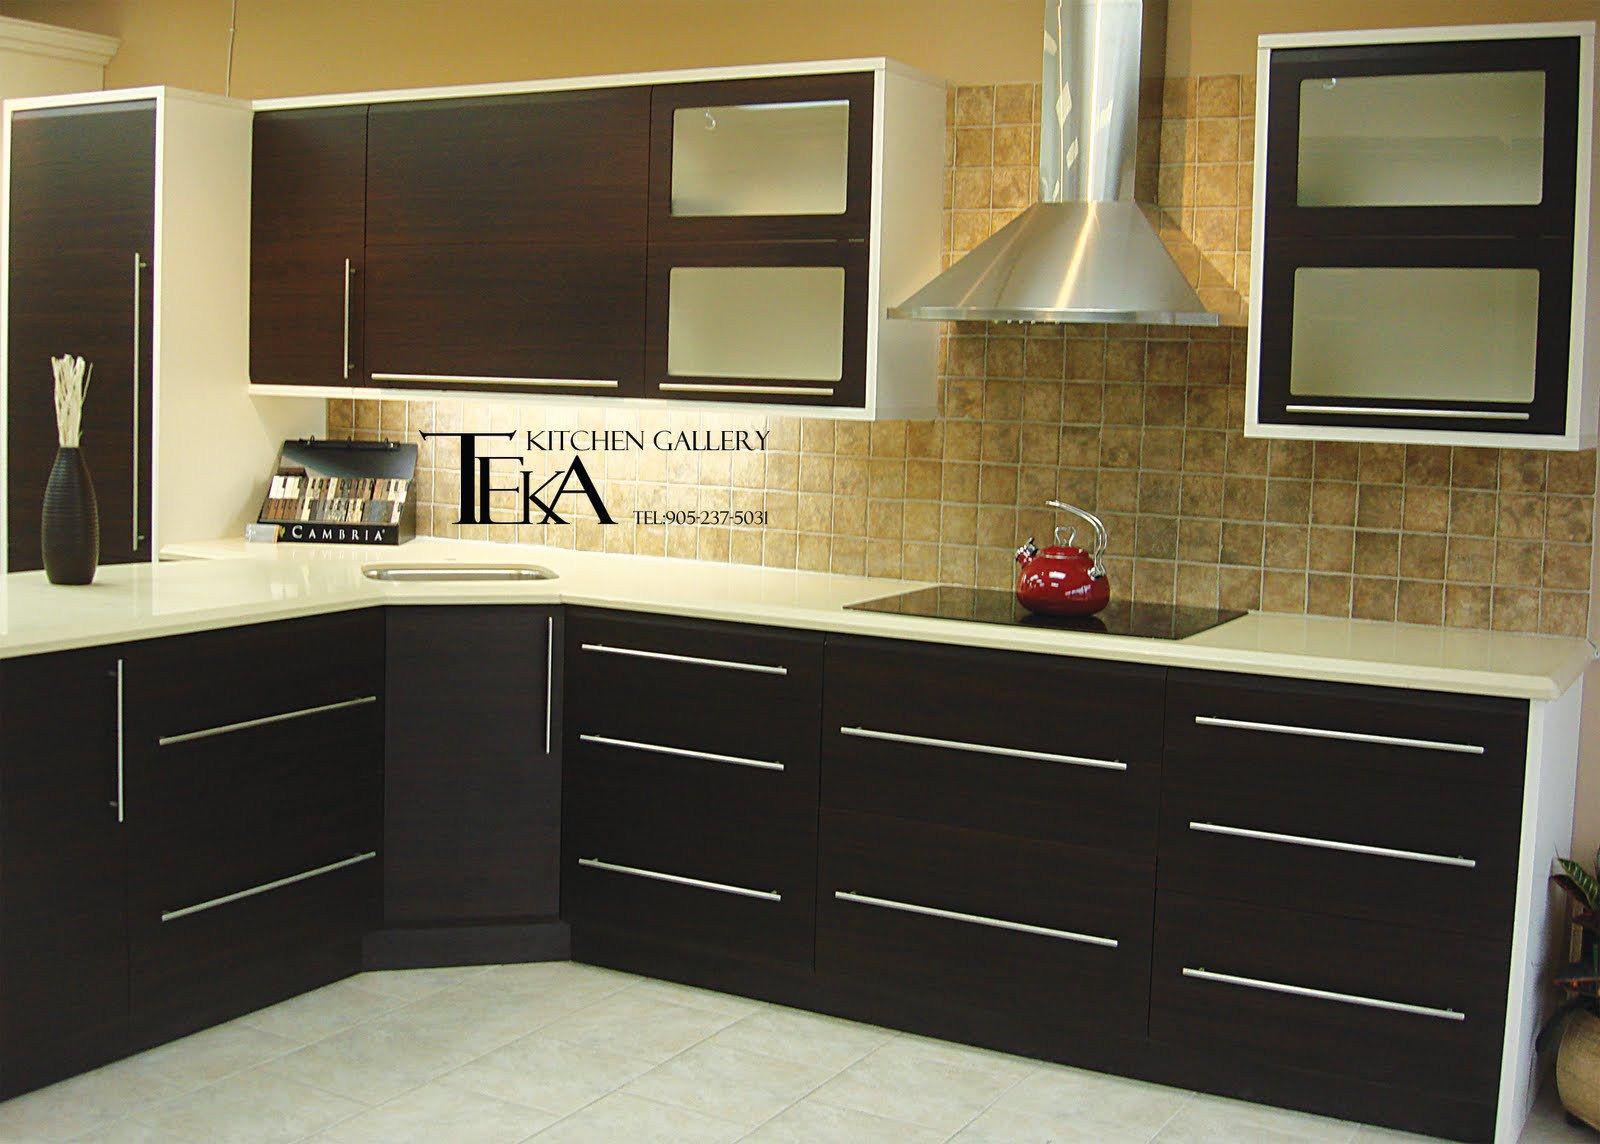 Classy Simple Kitchen Cabinet Design Ideas